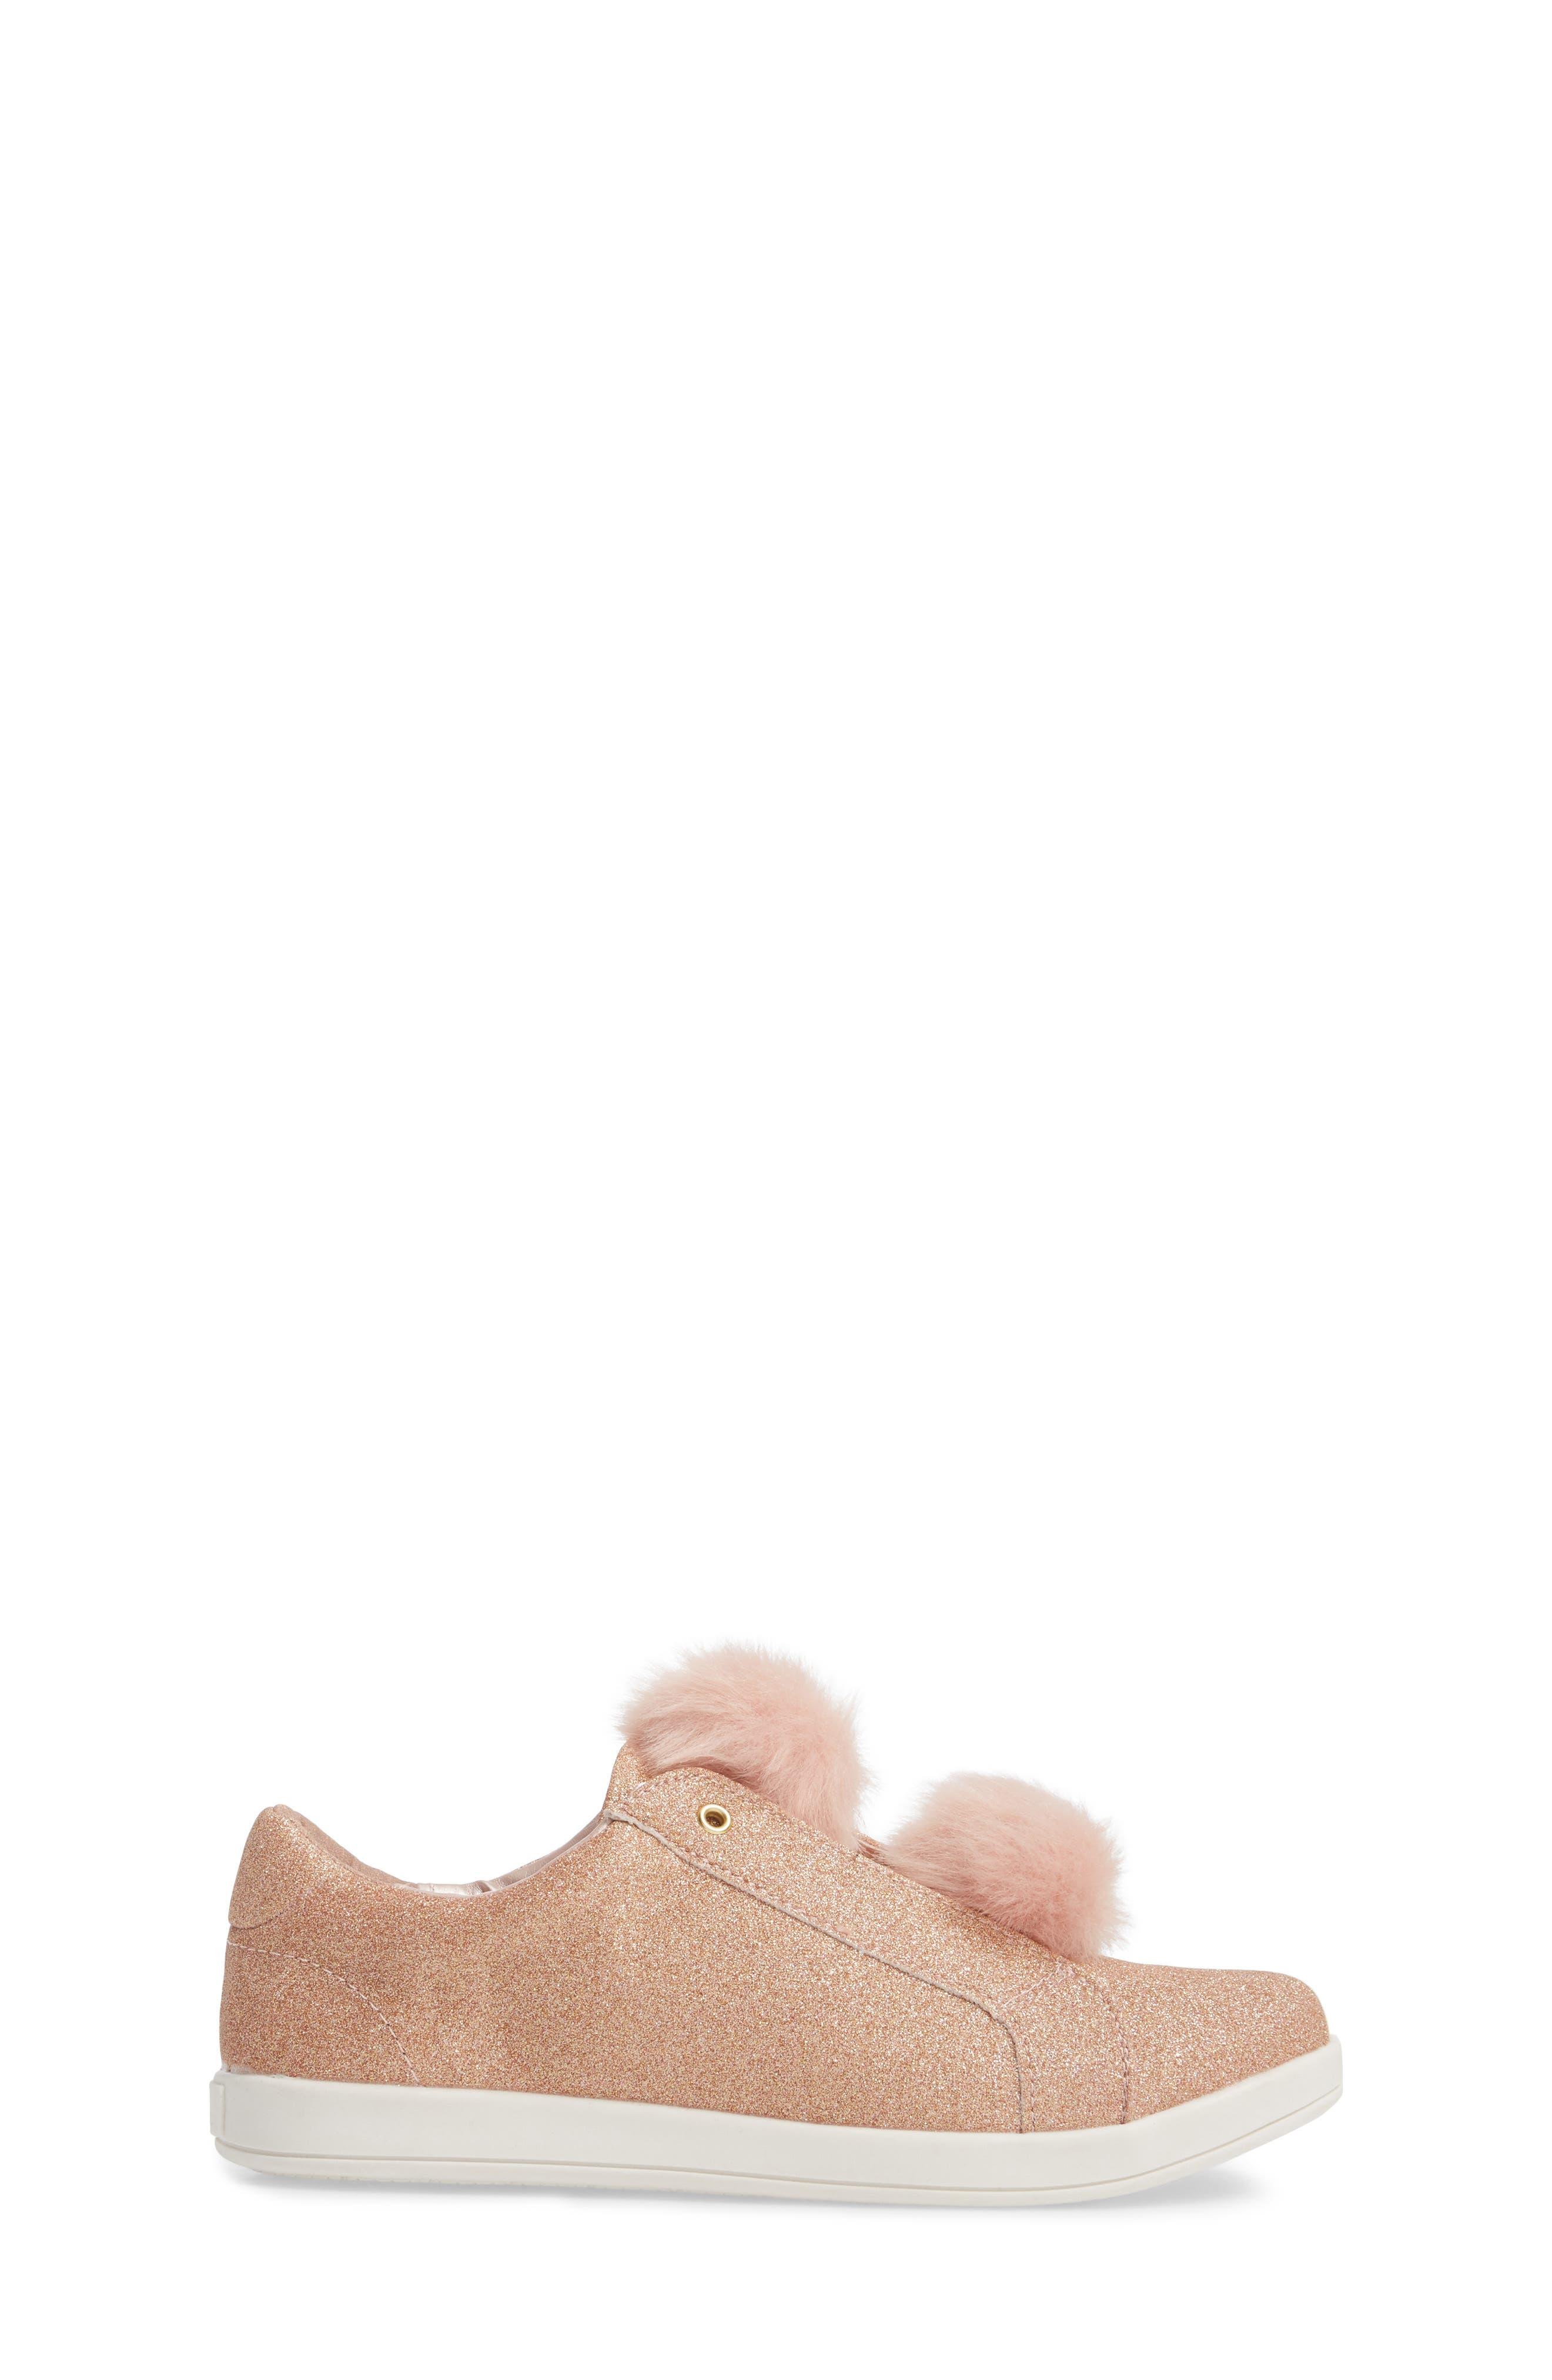 Alternate Image 3  - Sam Edelman Cynthia Leya Faux Fur Pompom Slip-On Sneaker (Toddler, Little Kid & Big Kid)